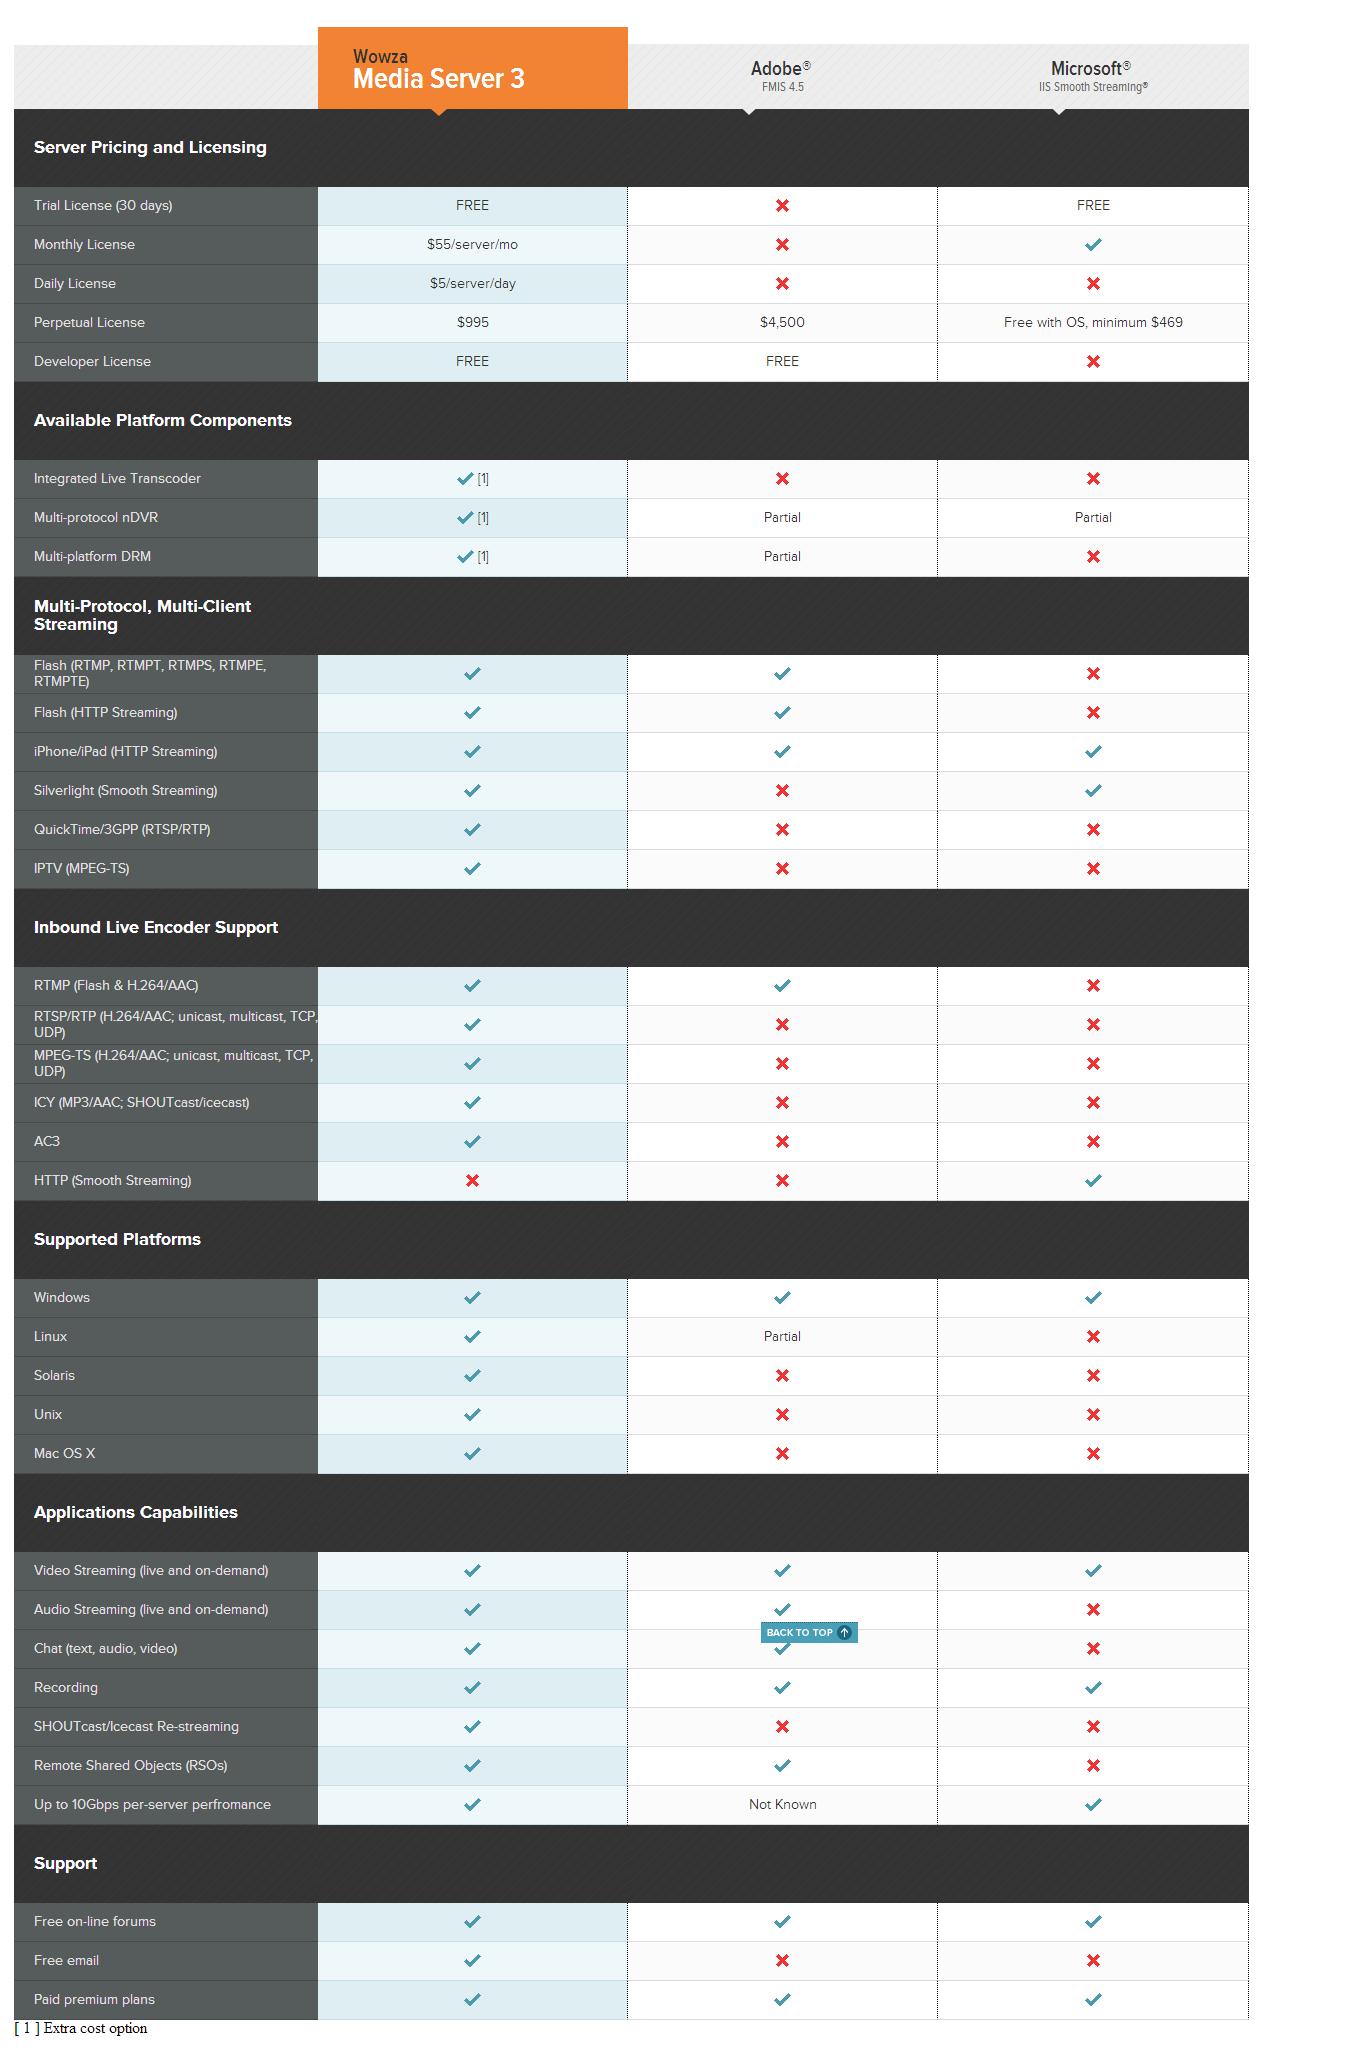 Comparison between Wowza, Adobe FMIS and Microsoft IIS